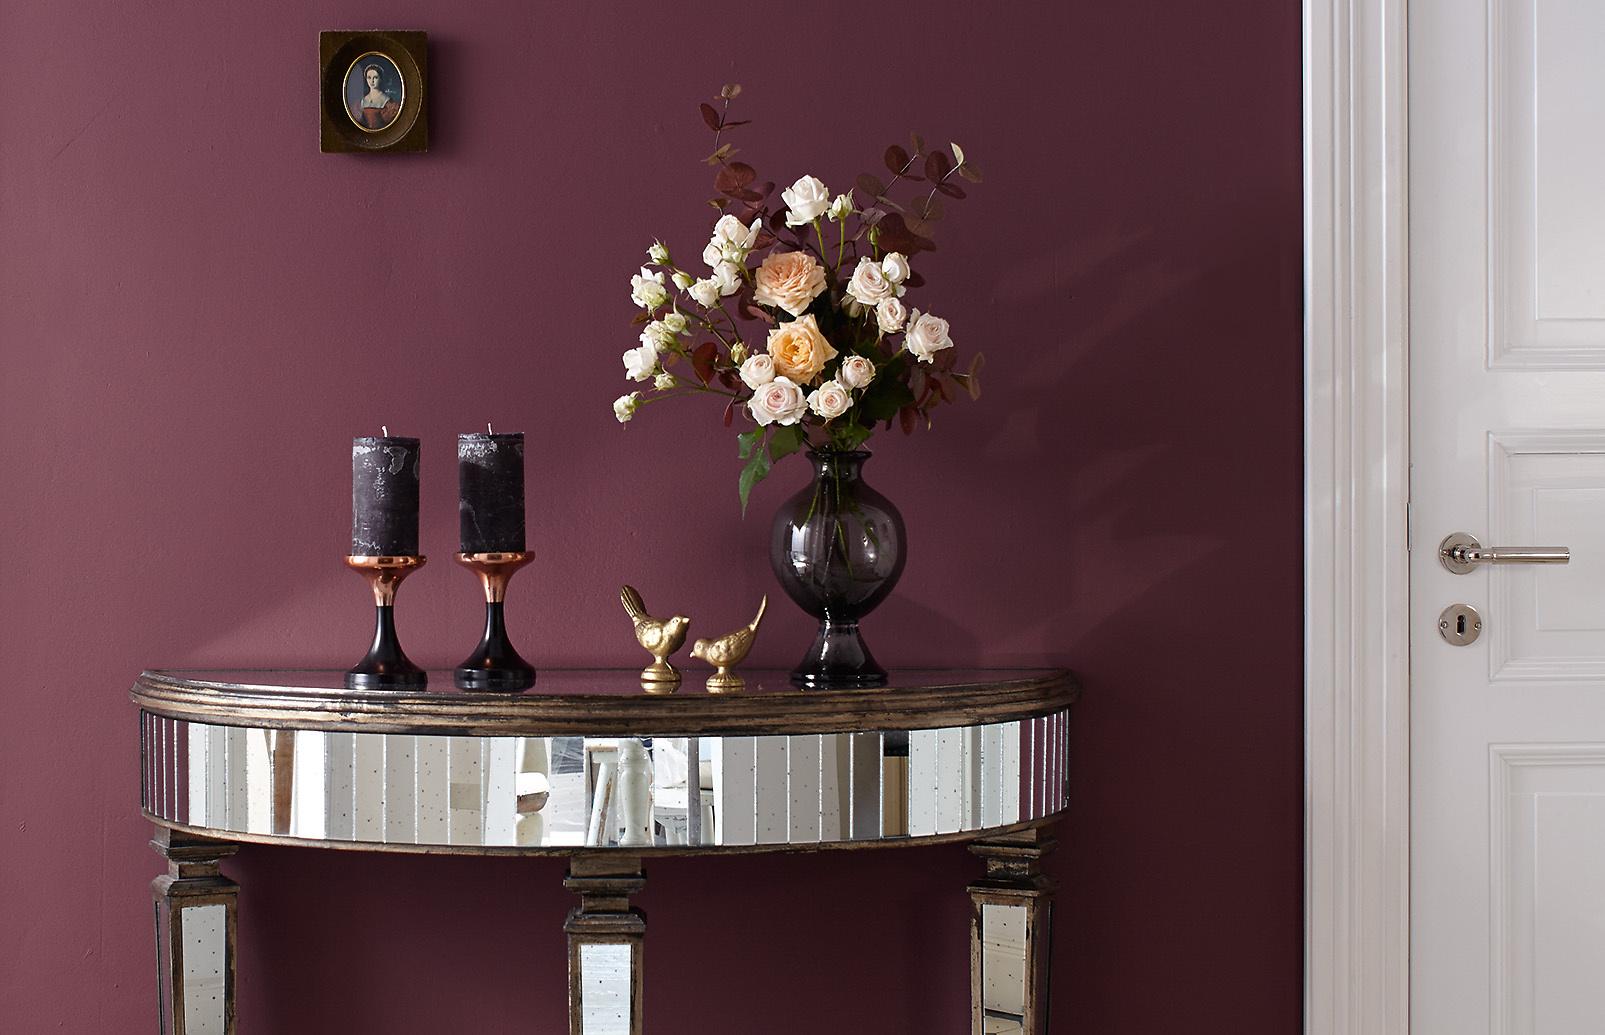 premium-wandfarbe. violett, purpur: alpina feine farben farbe der